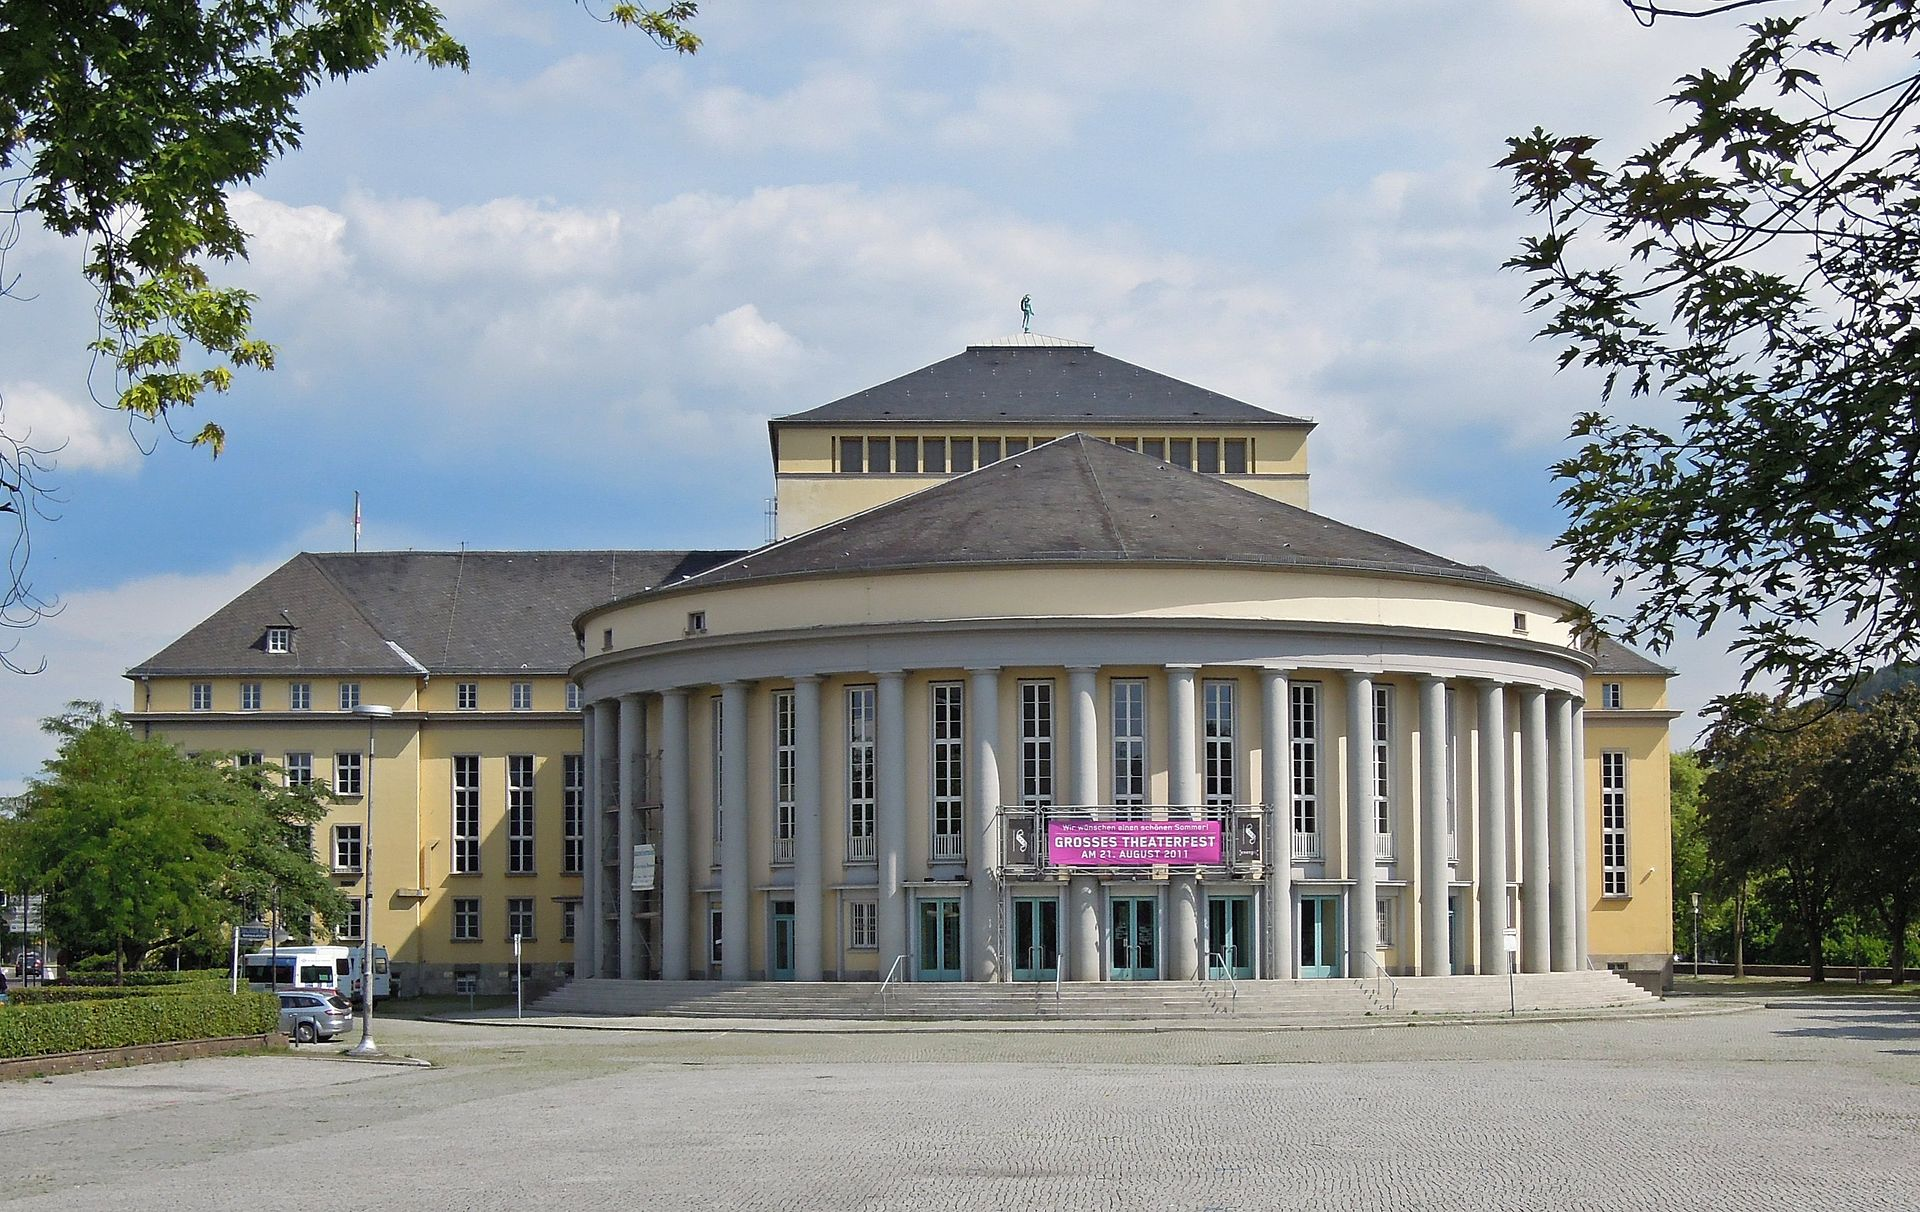 Bild Saarländisches Staatstheater Saarbrücken